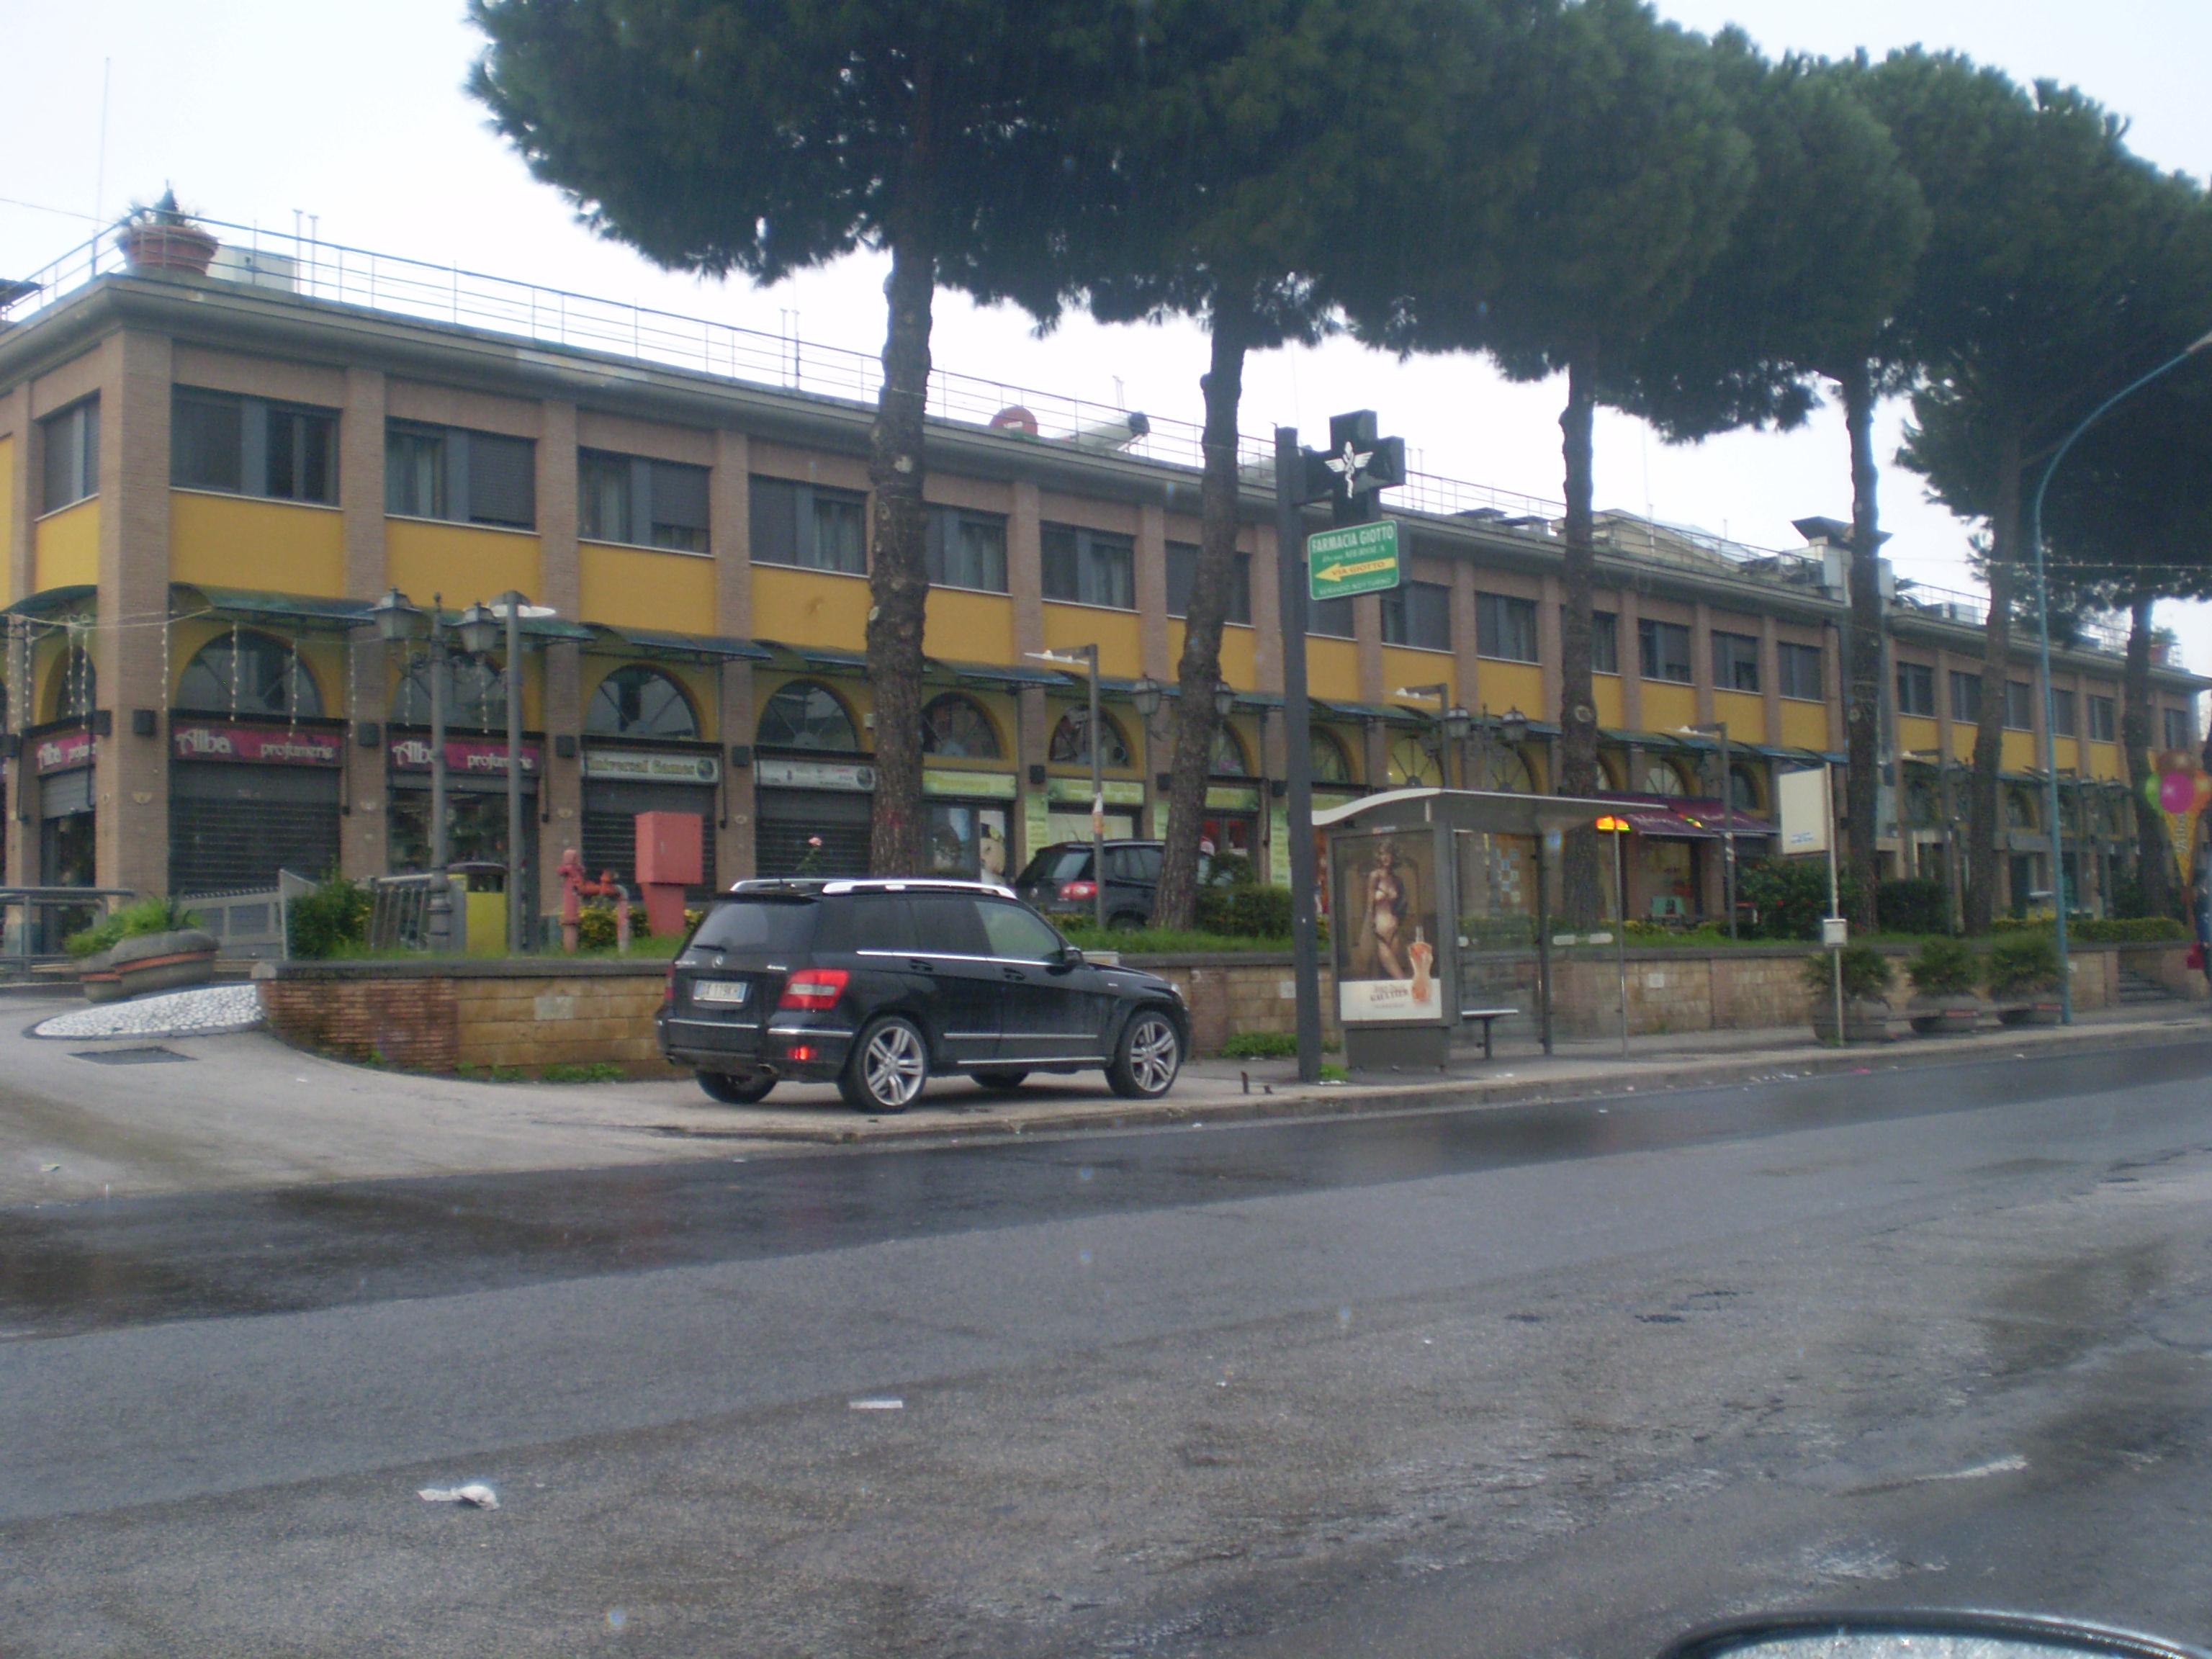 Casoria Italy  City pictures : ... Casoria, Naples, Italy, via nazionale delle puglie | italy.realigro